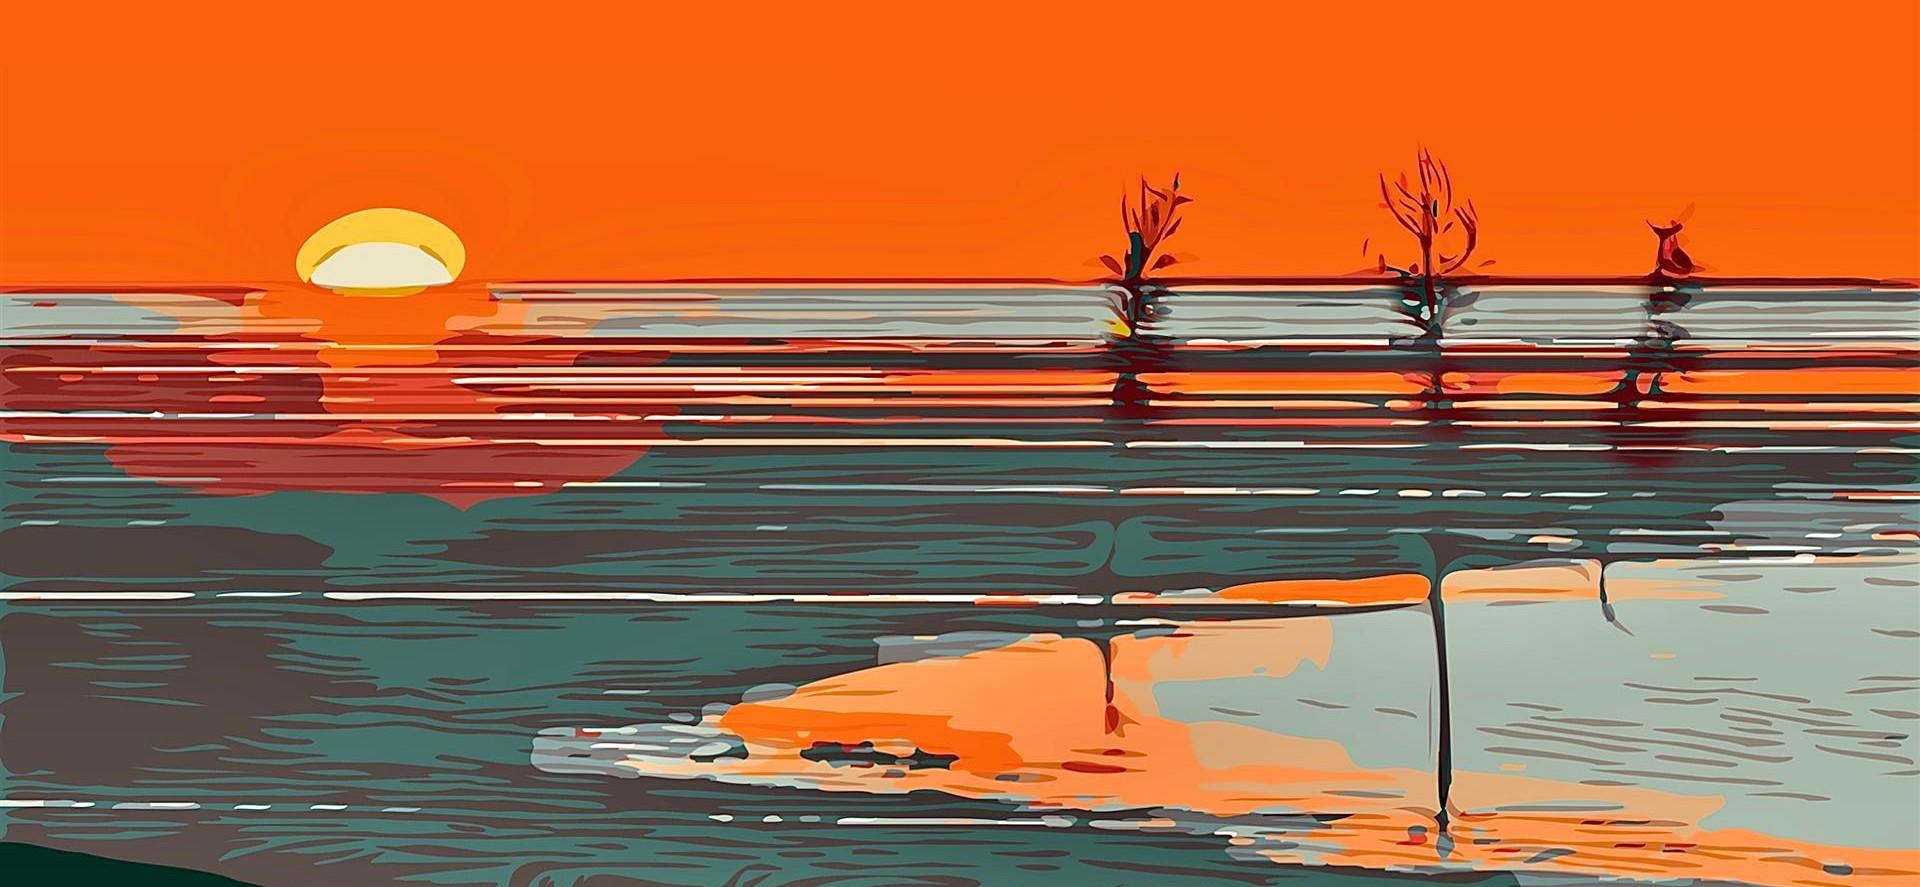 Summer Sunset at Rock Harbor by Rita Colantonio